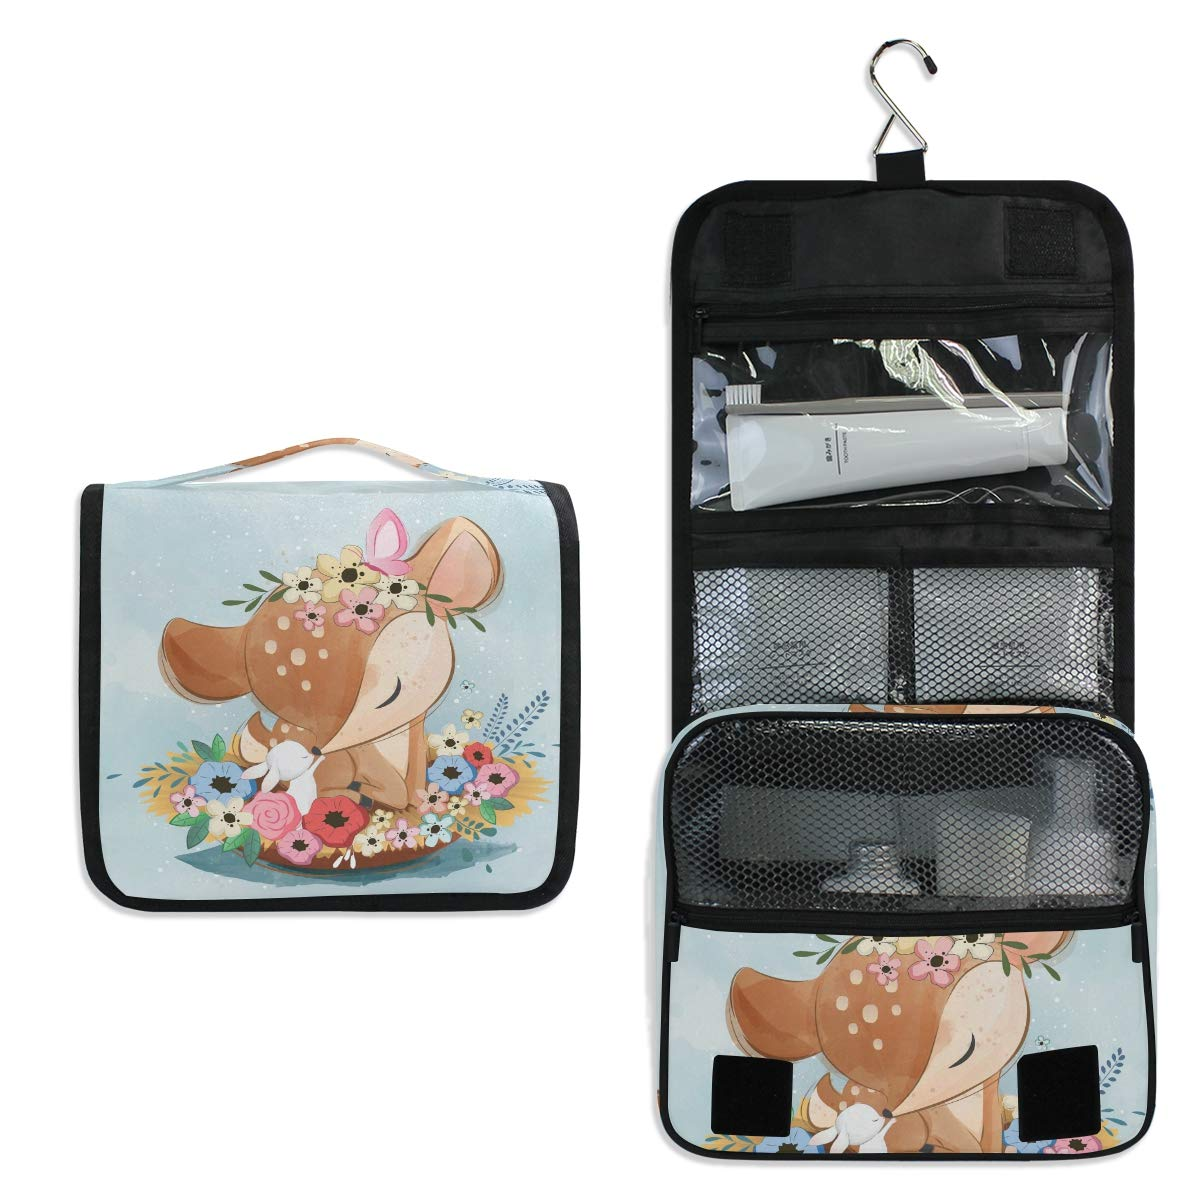 Hanging Travel Toiletry Bag - Cute Deer Waterproof Cosmetic Bag Portable Makeup Pouch for Women Girls Men